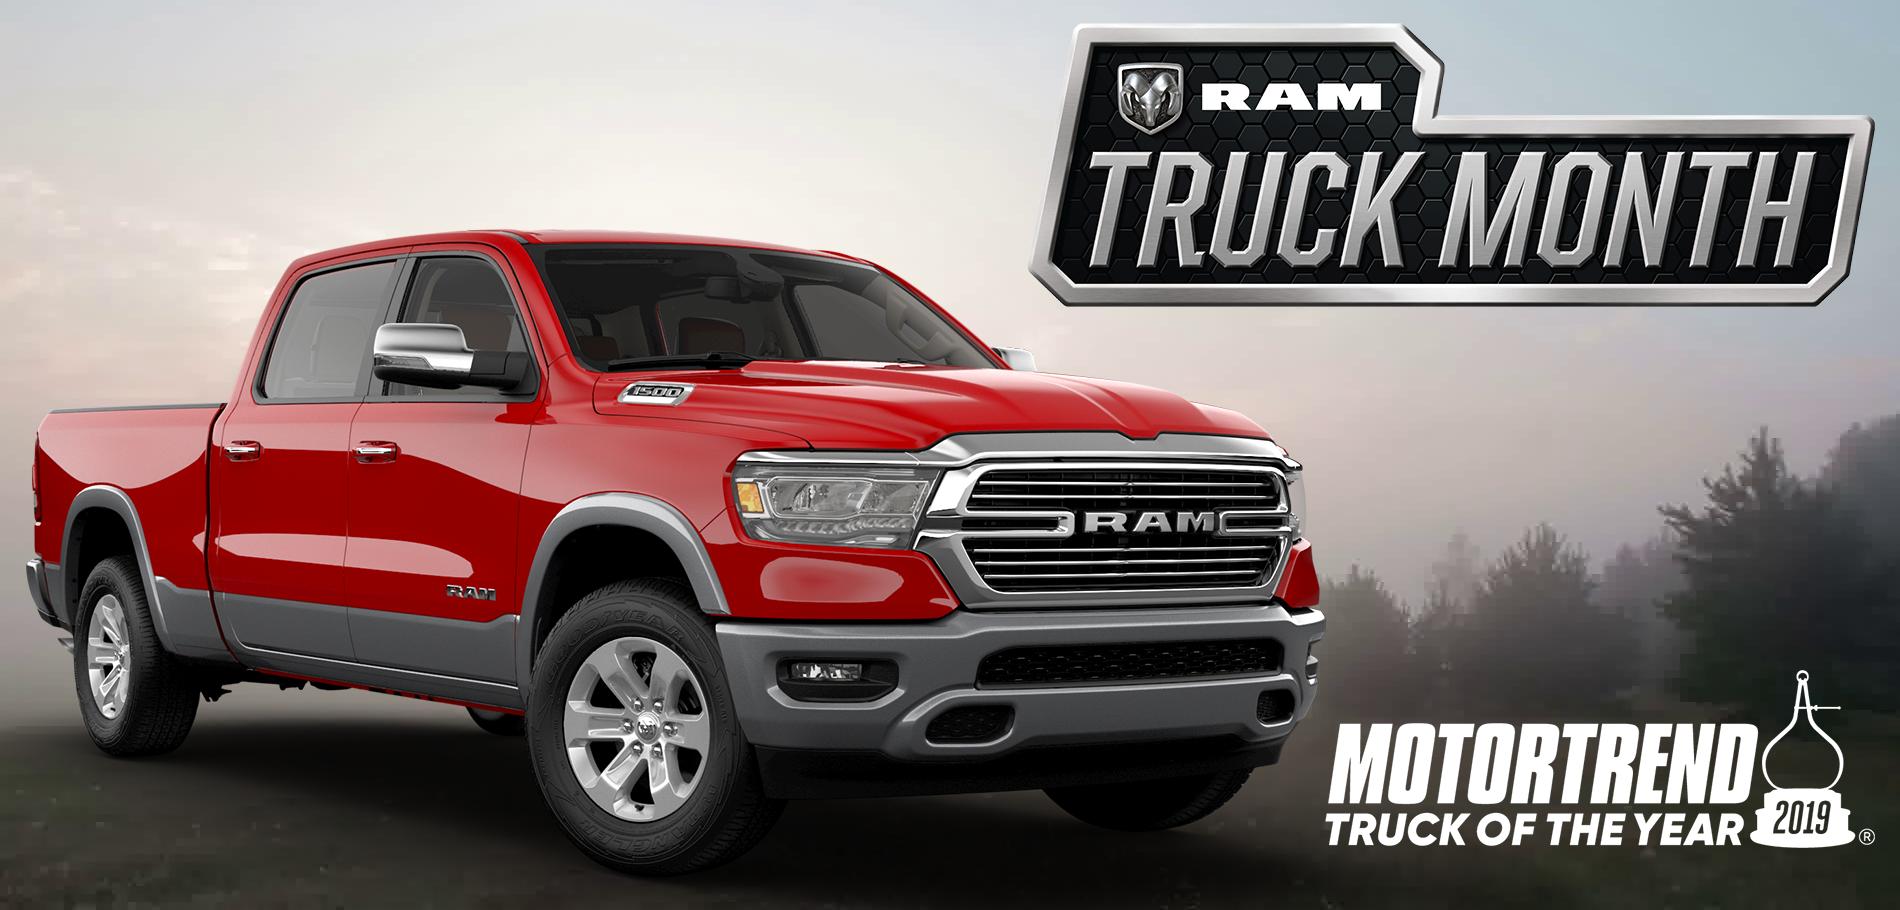 19 RAM Truck Month MotorTrend